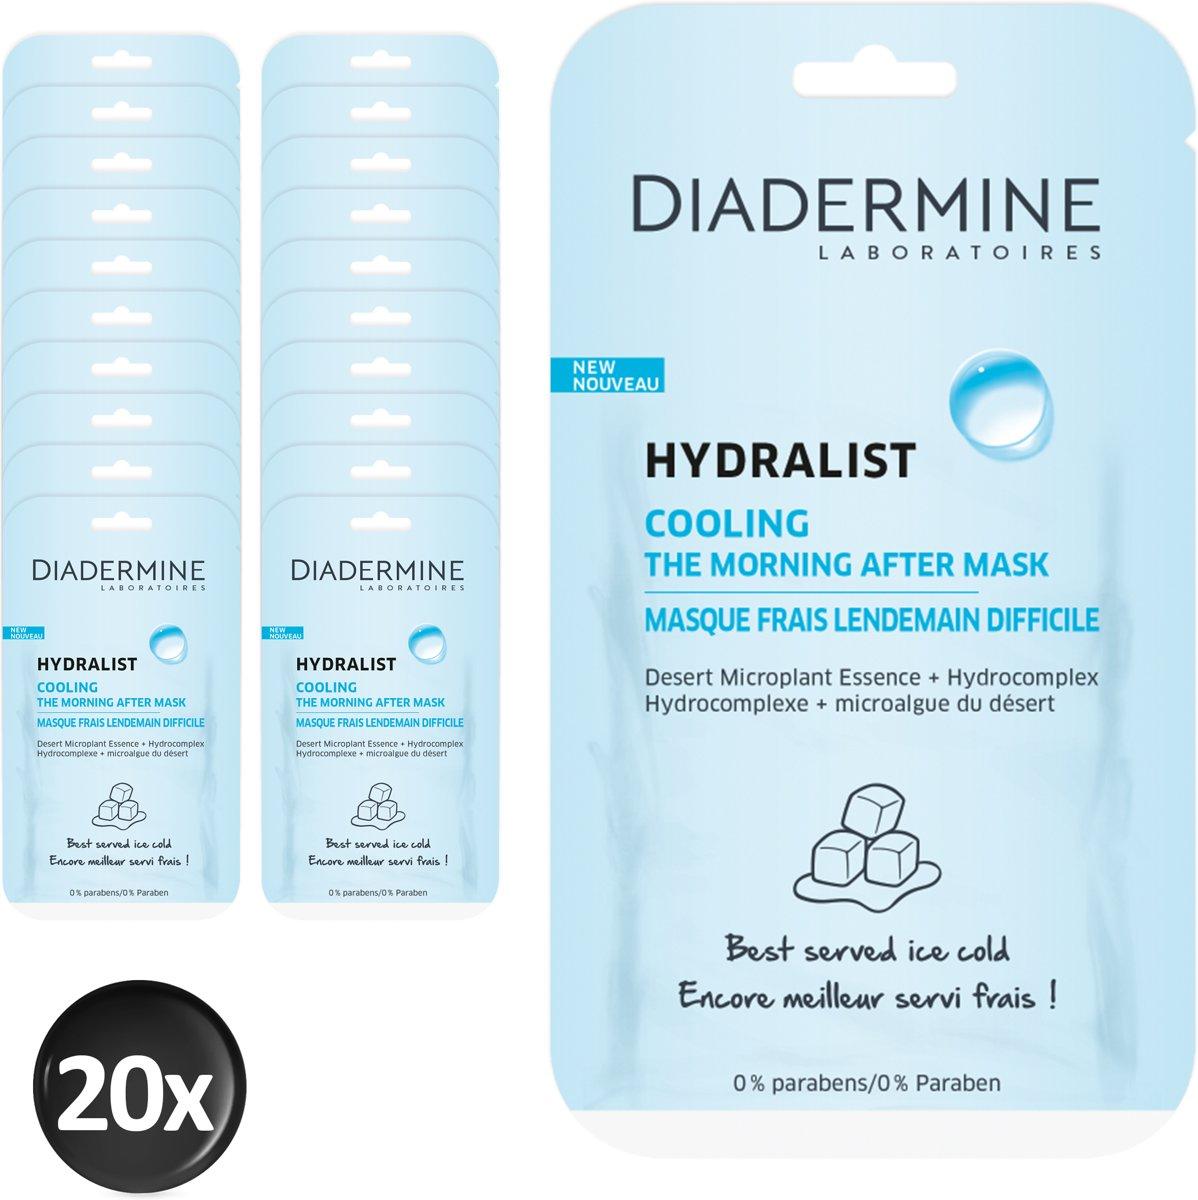 Diadermine Hydralist Cooling Gezichtsmasker 8 ml - 20 stuks - Voordeelverpakking